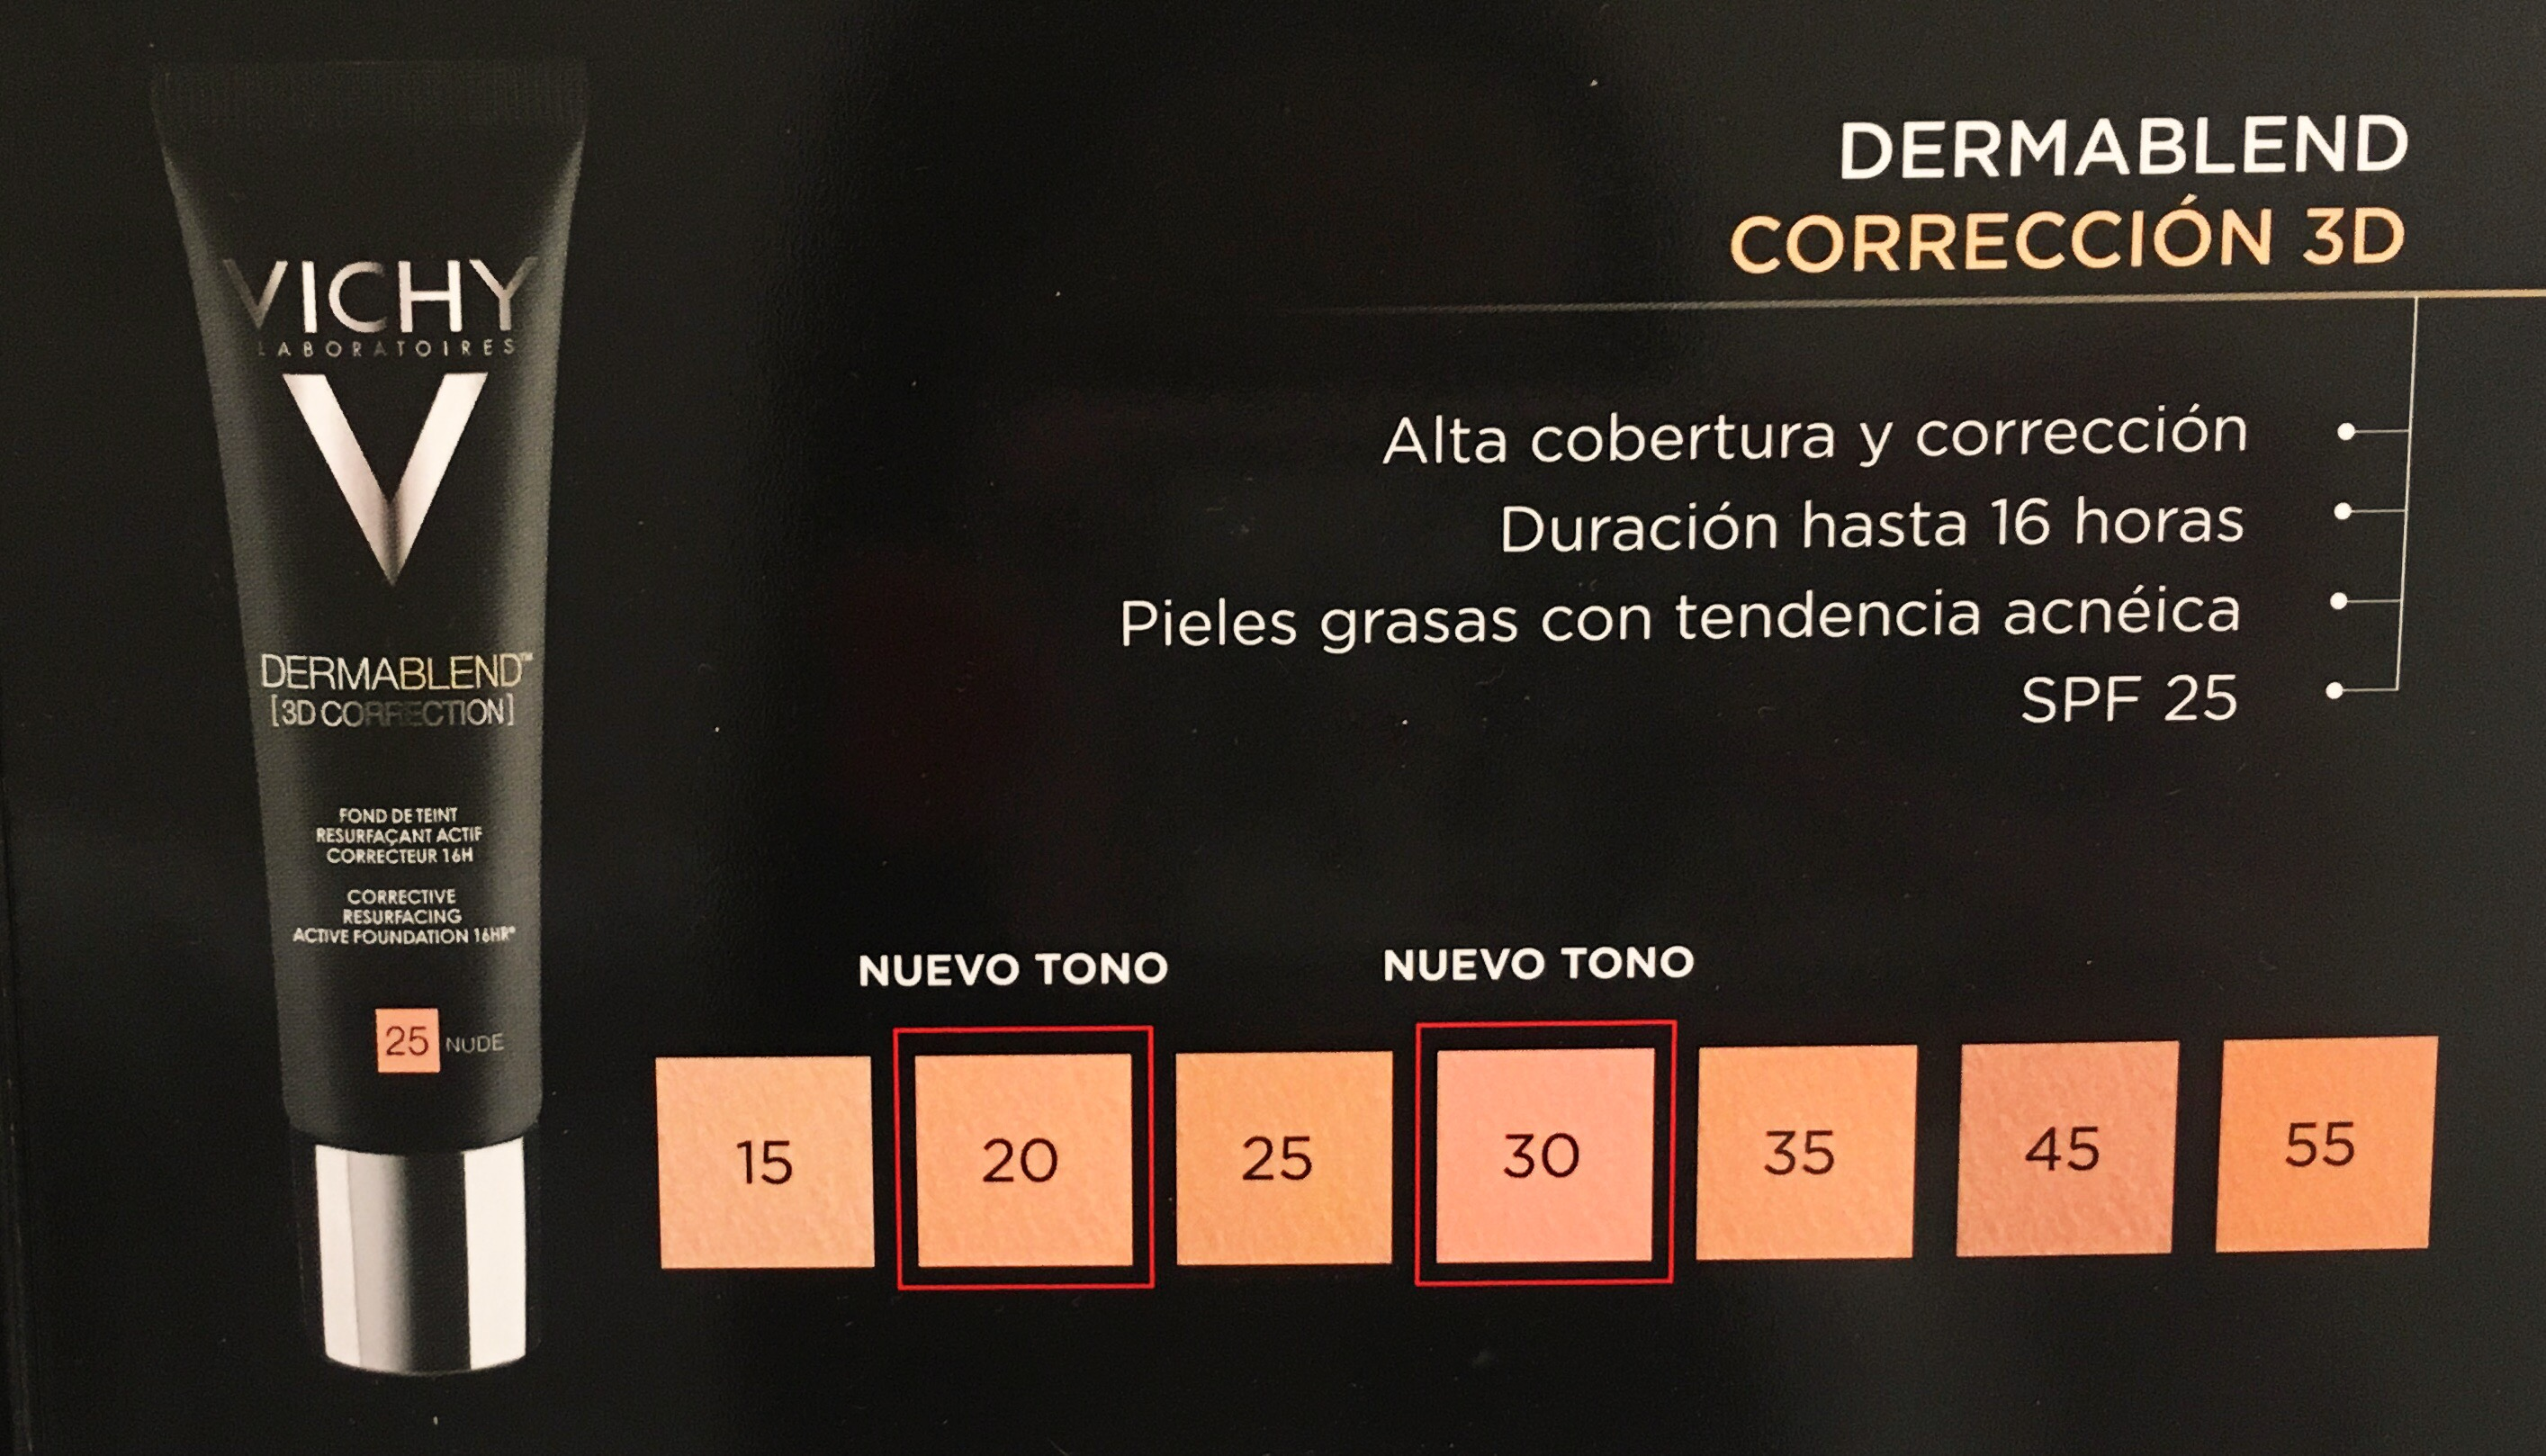 DERMABLEND 3D CORRECTION SPF 25 OIL FREE  Nº 45 GOLD